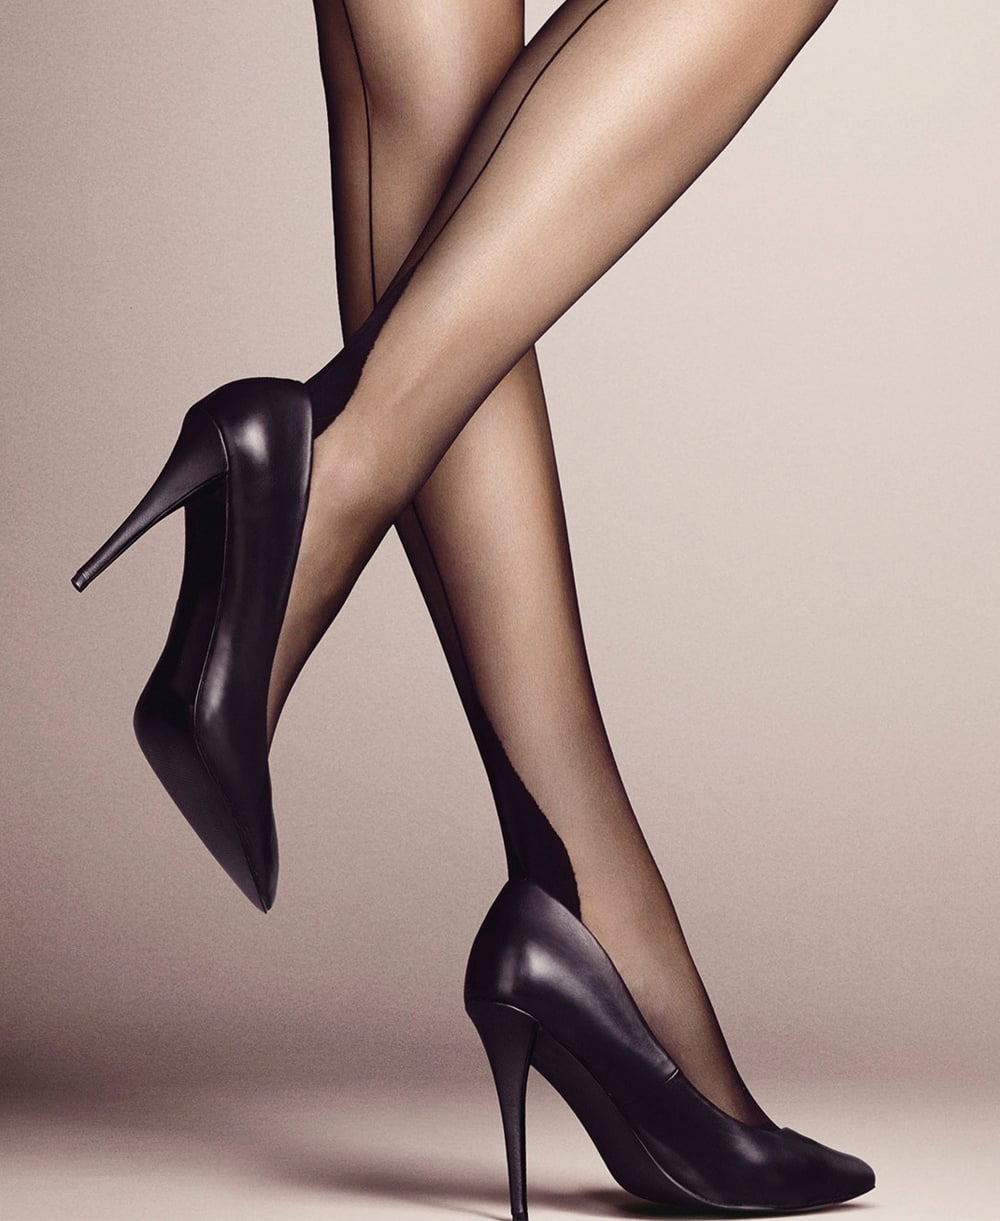 ac3fcc38a Falke High Heel Back Seam Tights - Tights from luxury-legs.com UK